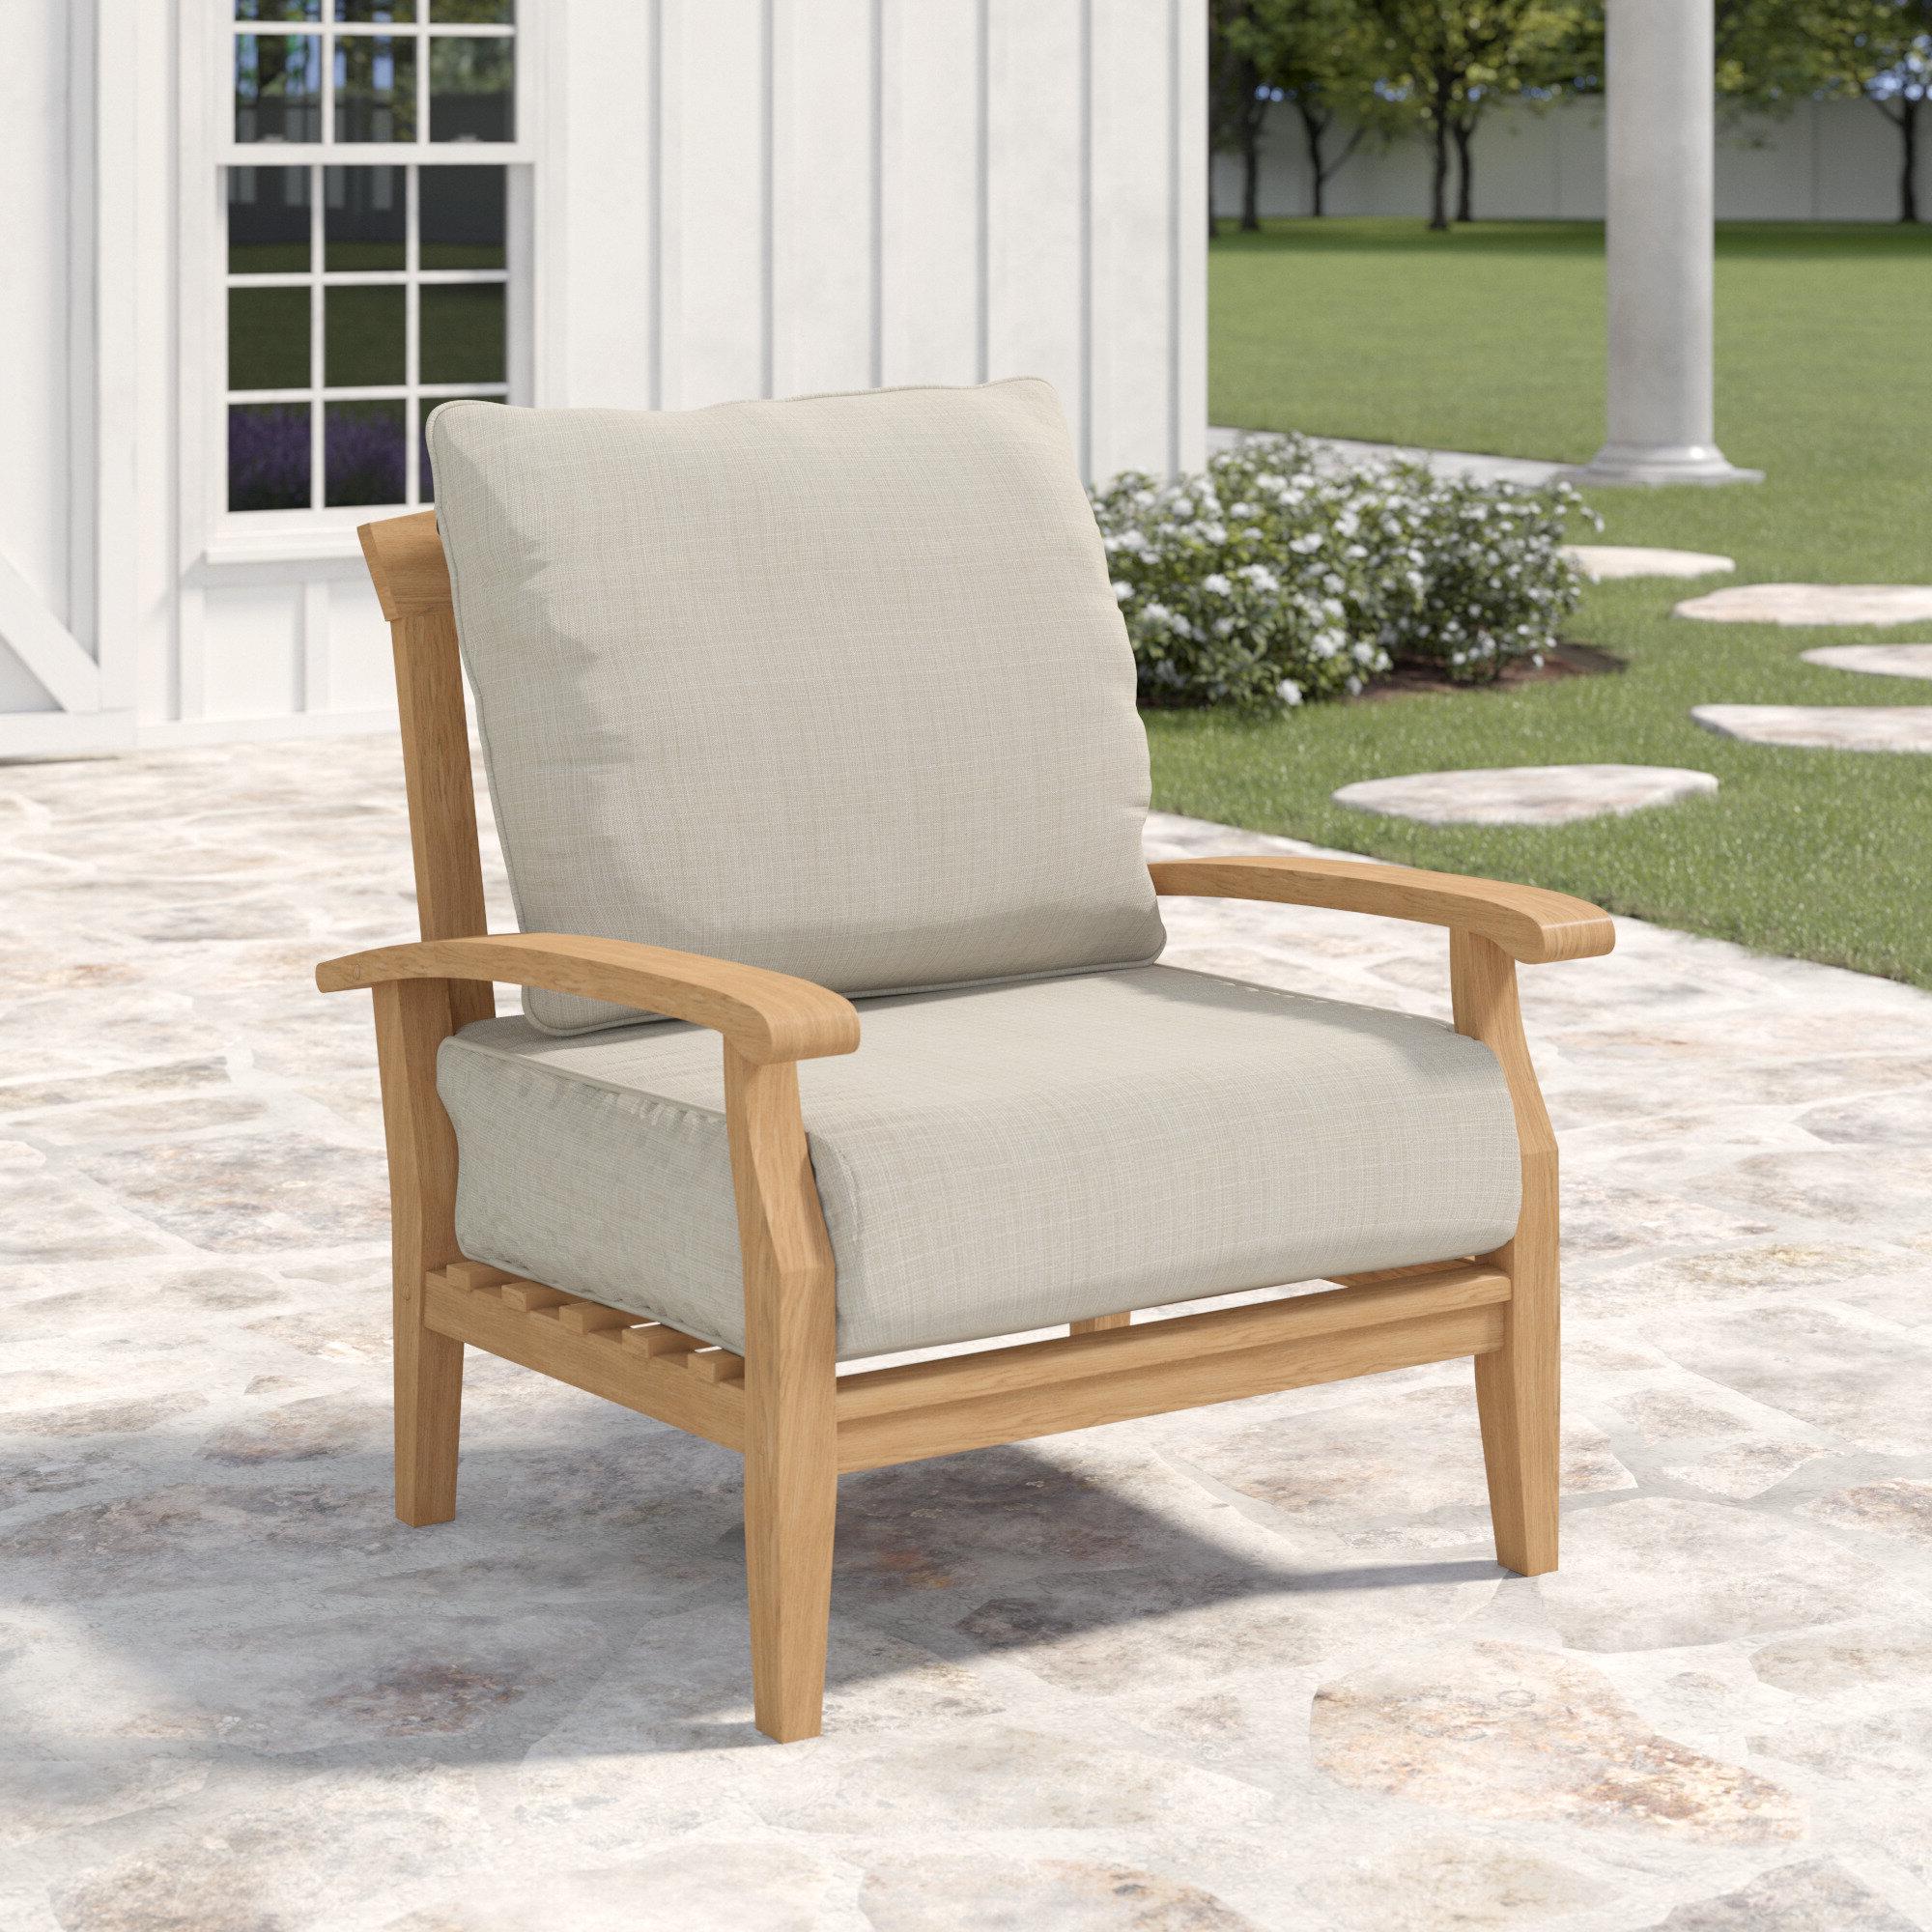 2019 Summerton Teak Patio Chair With Cushions Within Montford Teak Patio Sofas With Cushions (View 1 of 20)